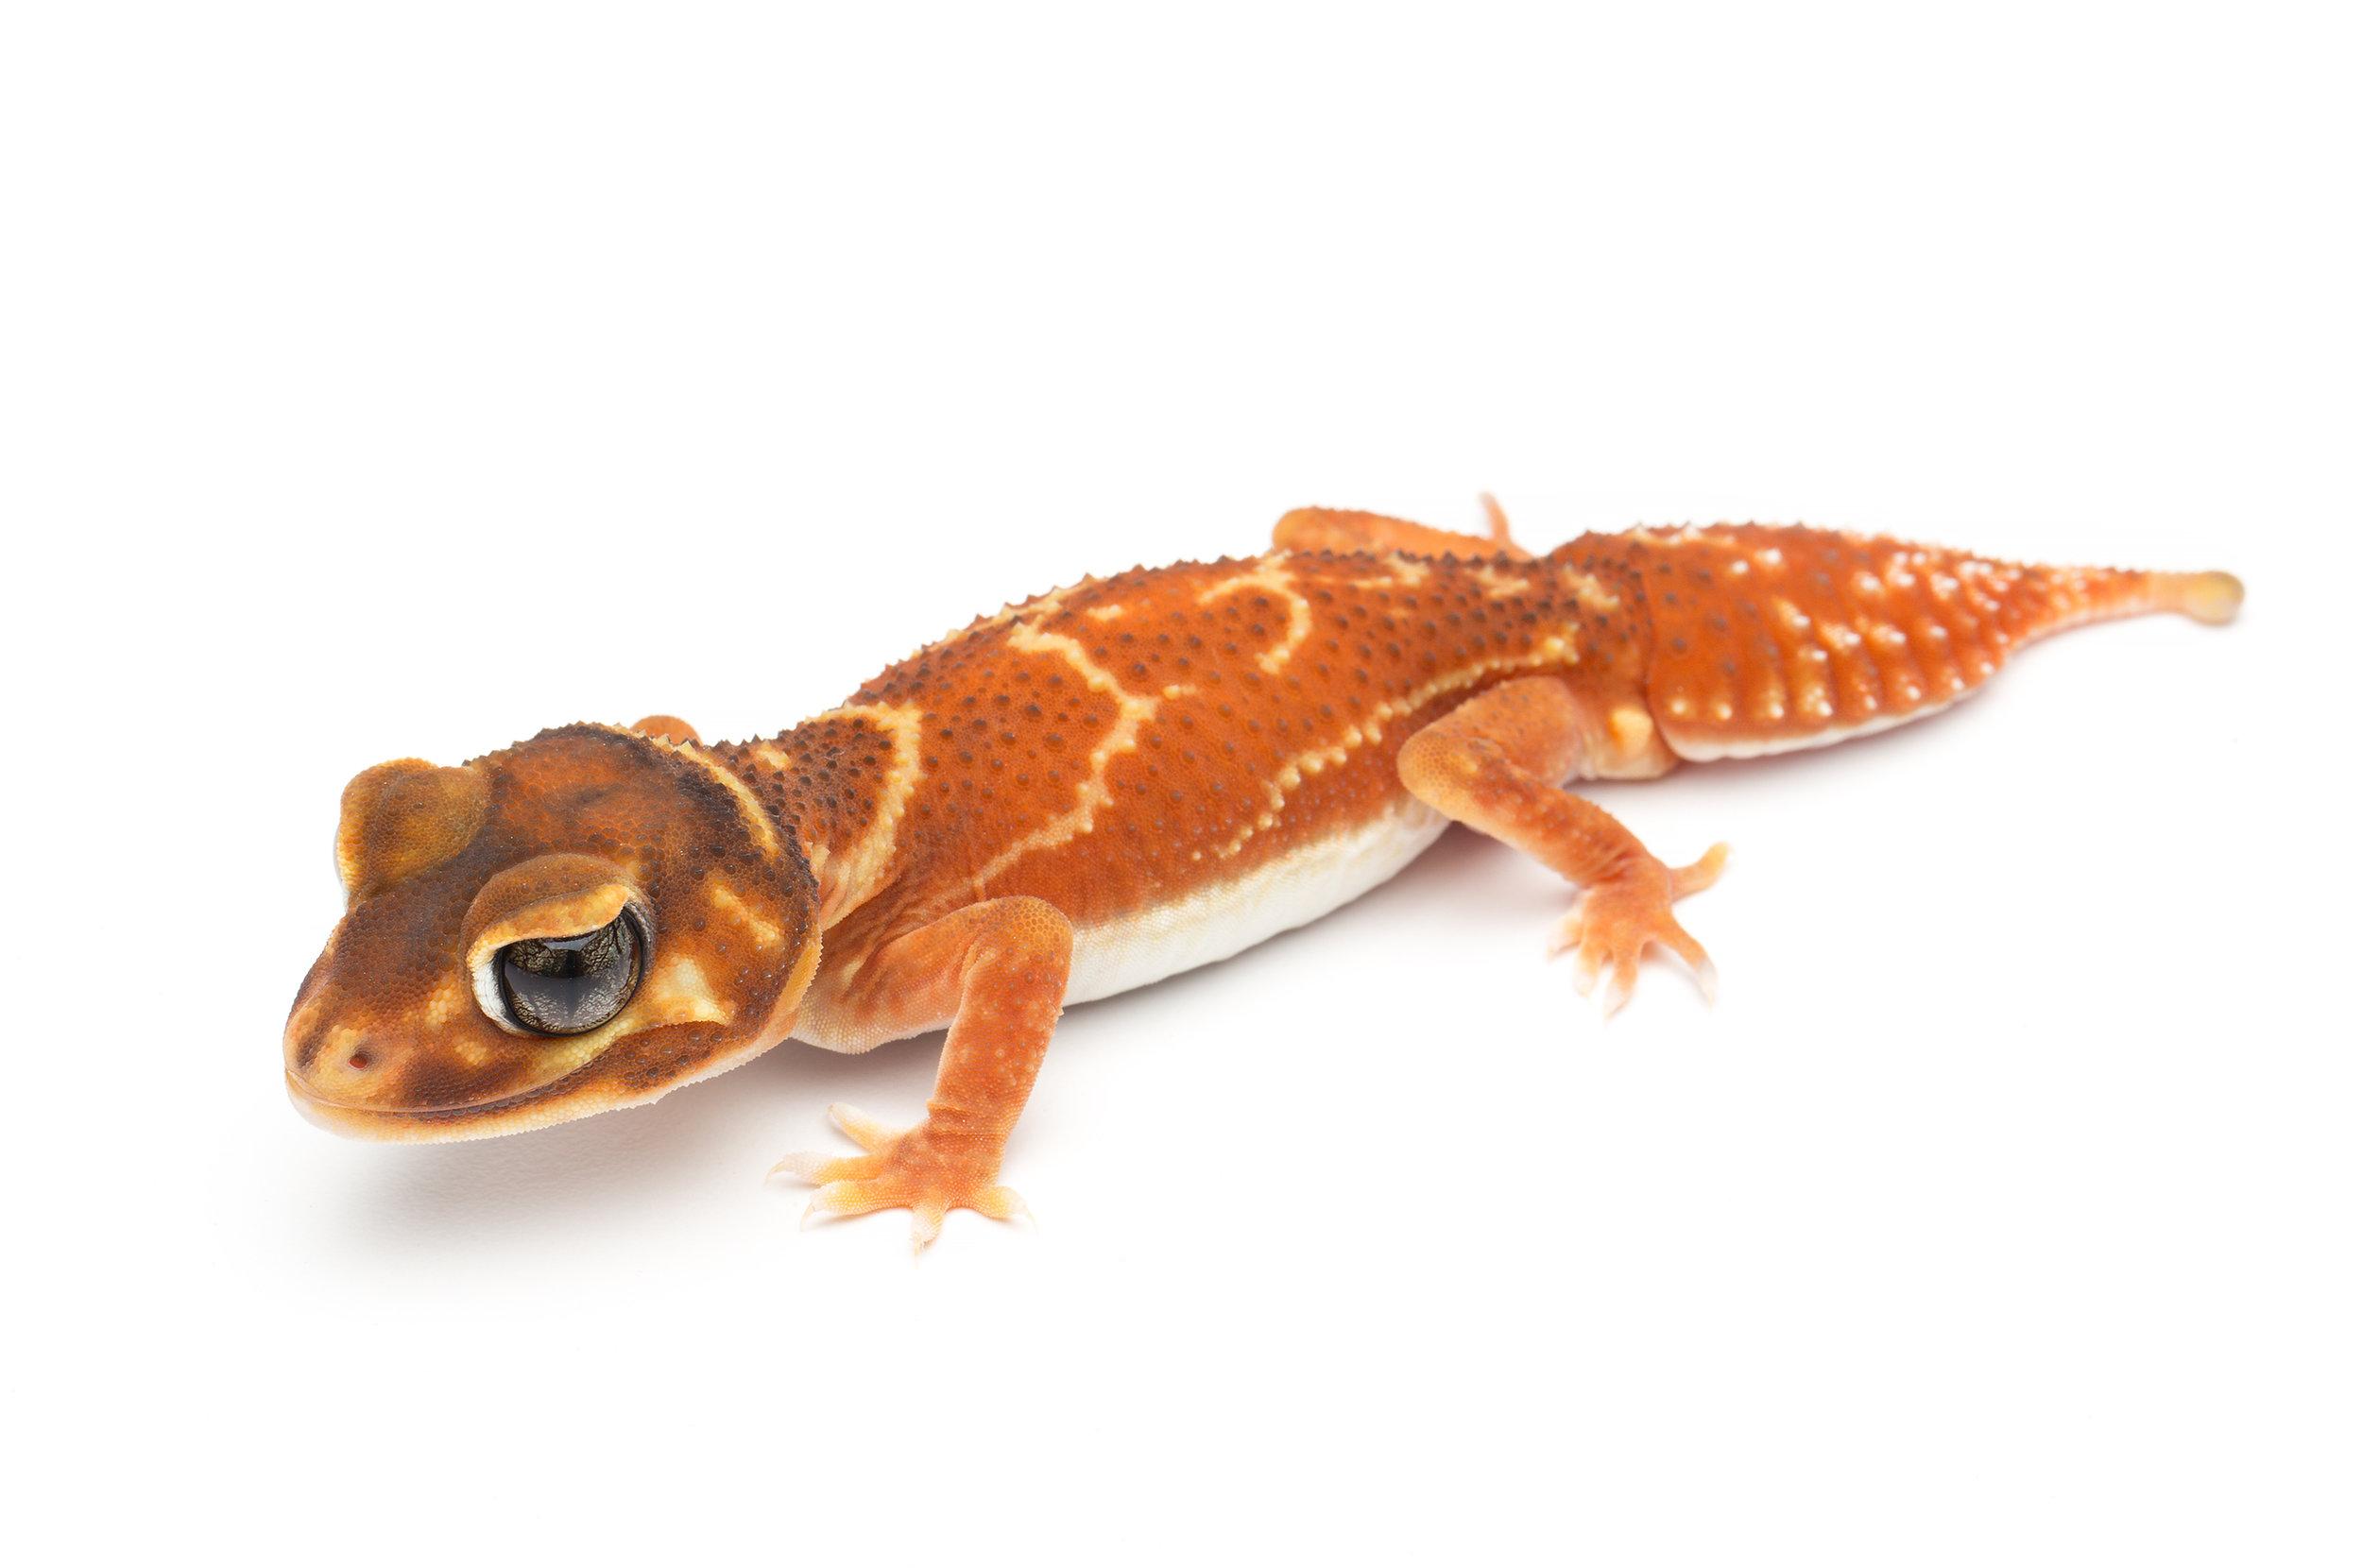 Male N. l. levis